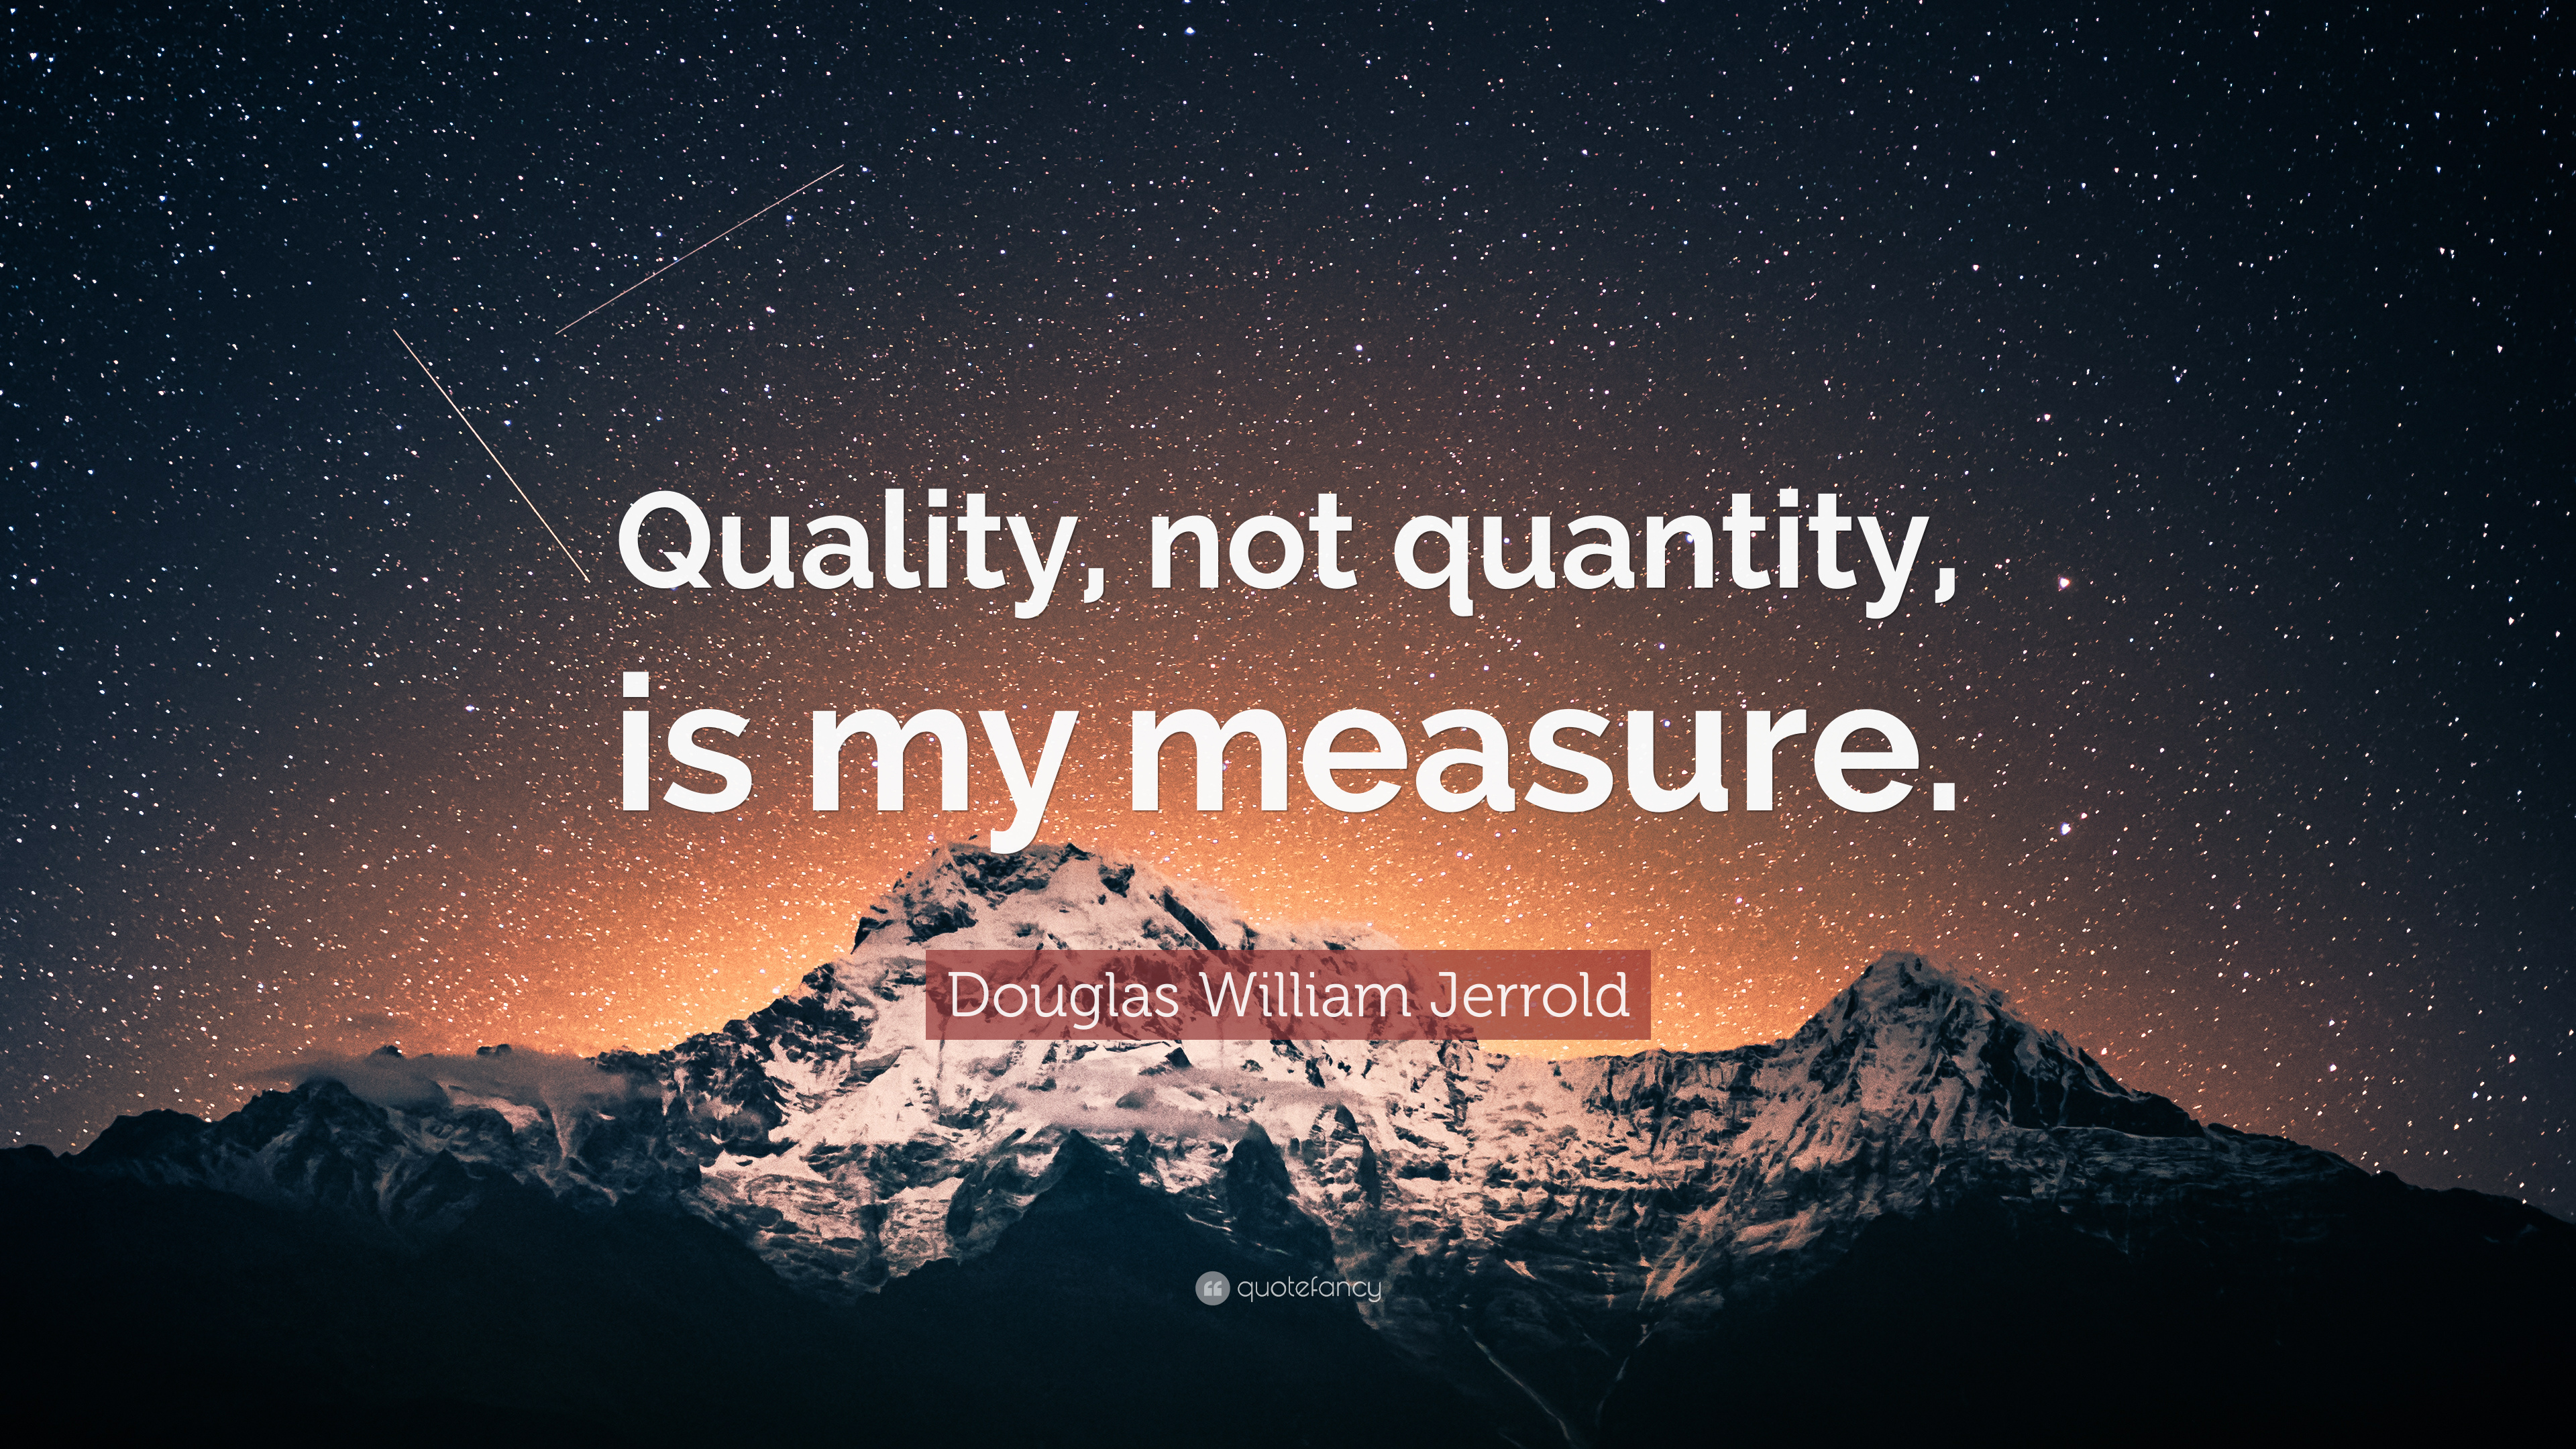 douglas william jerrold quote quality not quantity is my measure